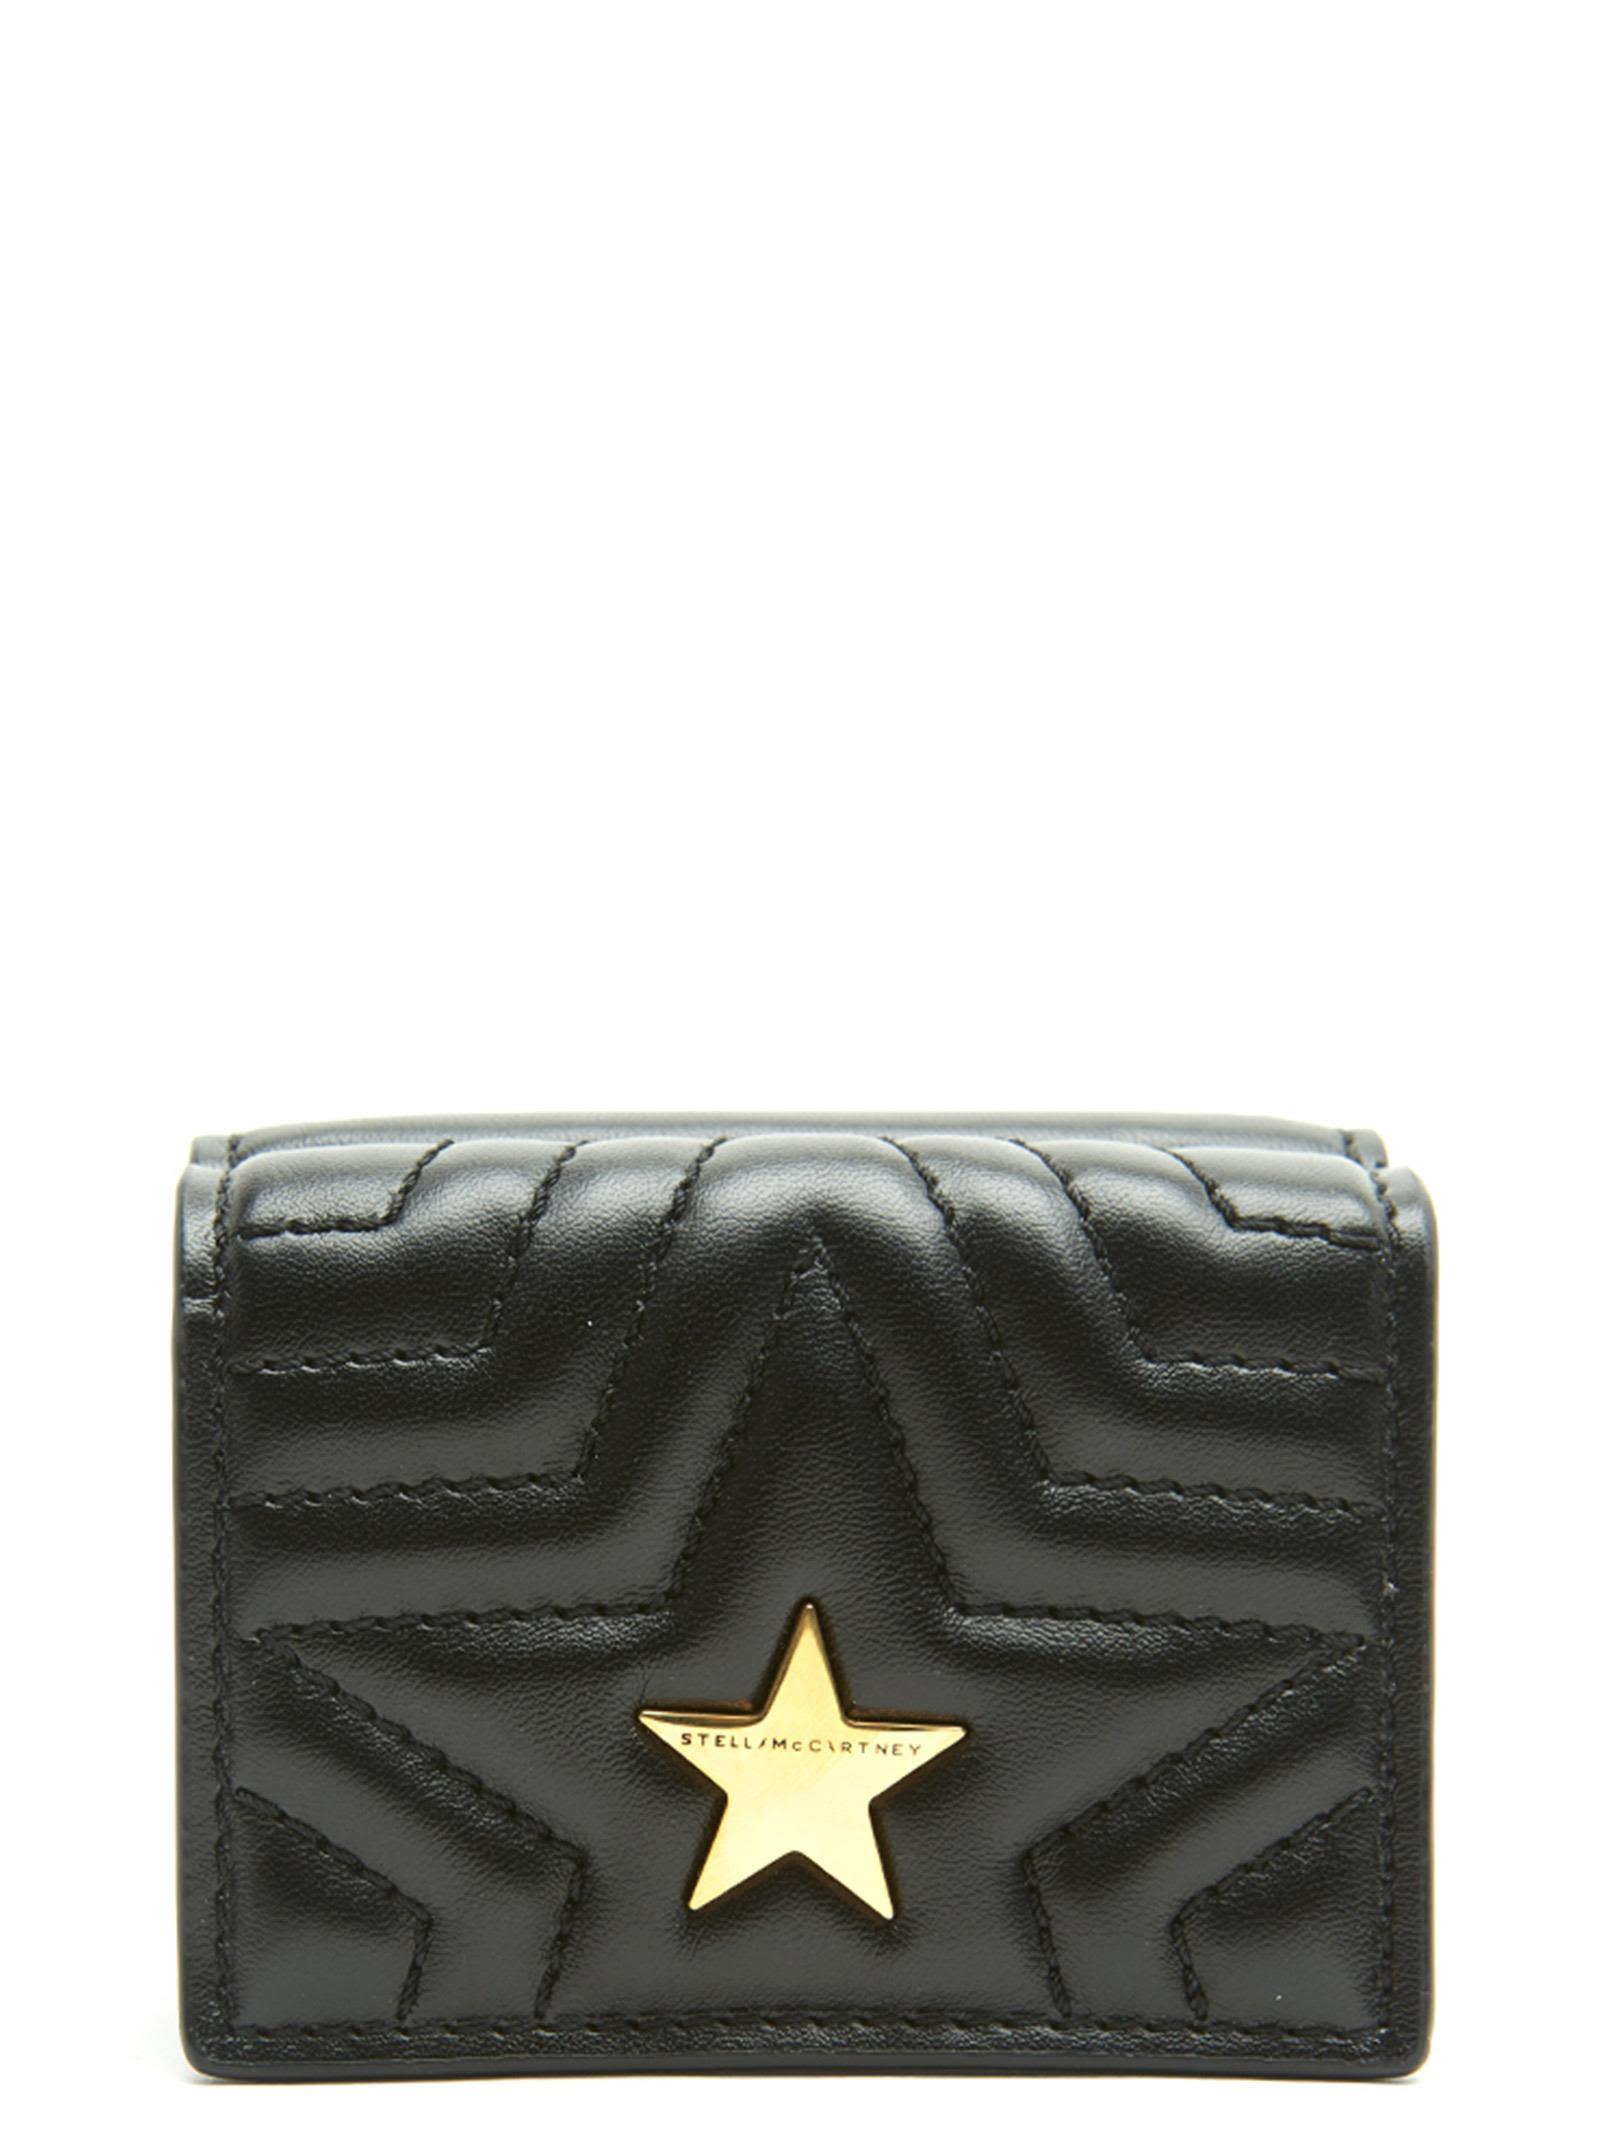 Stella Mccartney Stella Star Nappa Wallet in Black